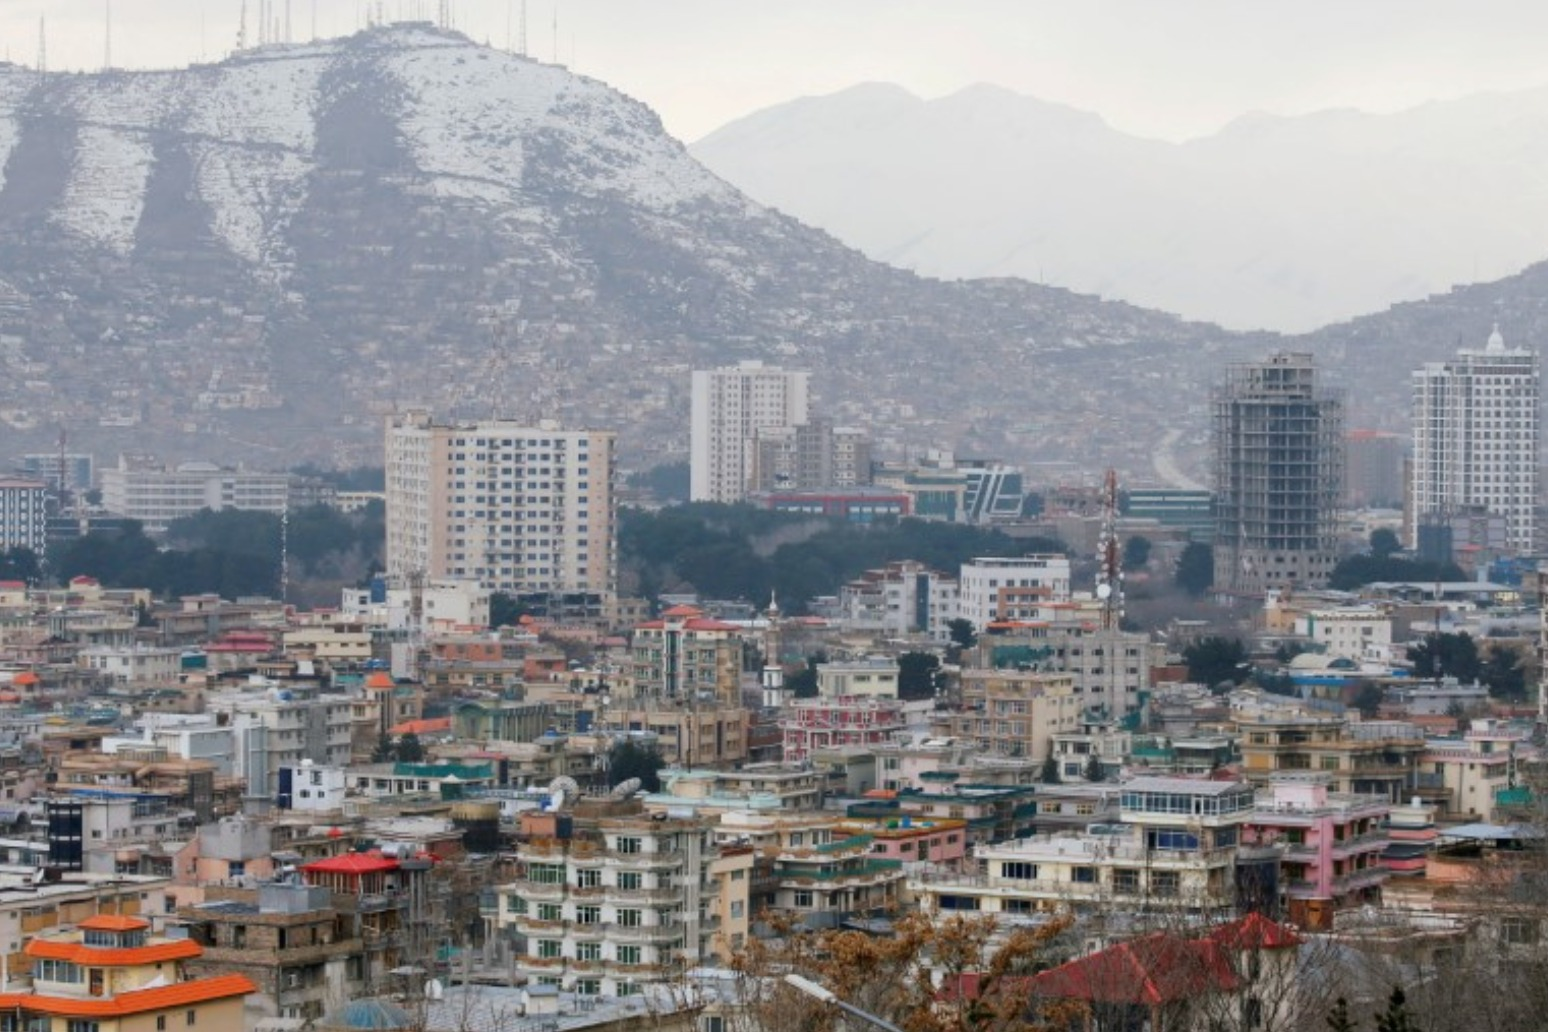 Taliban enter Afghan capital Kabul and demand surrender of government.